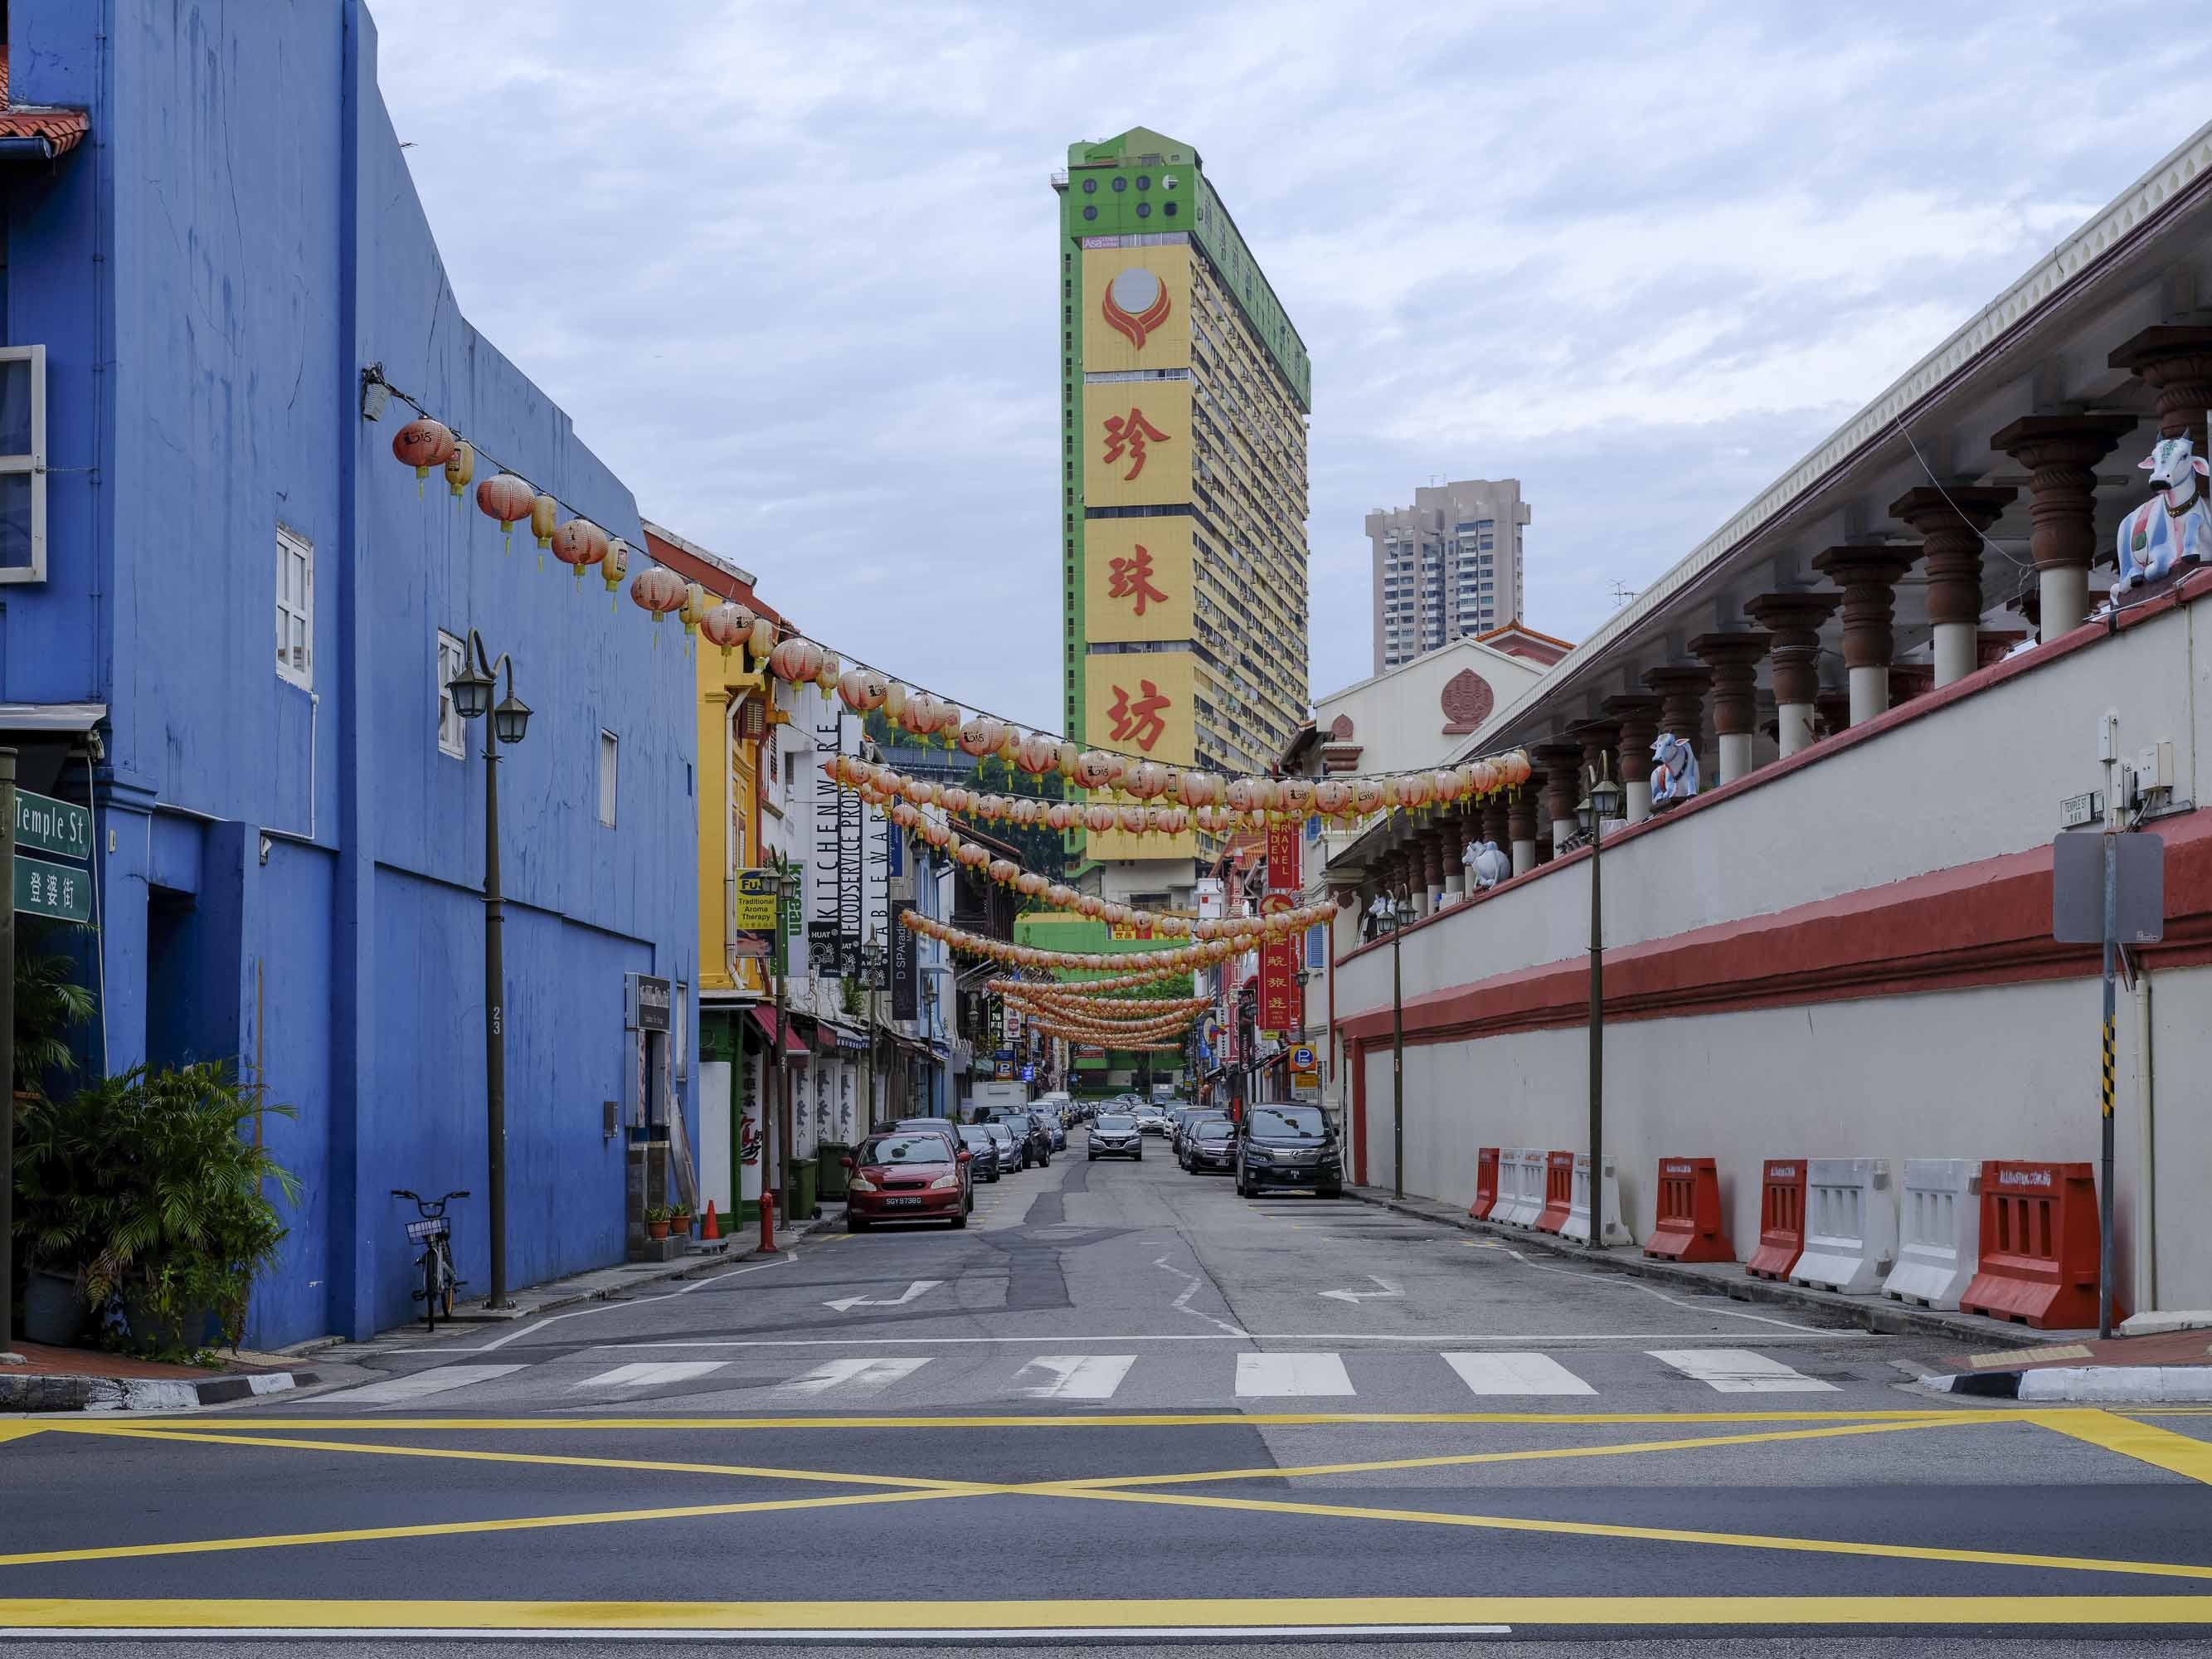 Tourism Travel Photography services commercial - Singapore